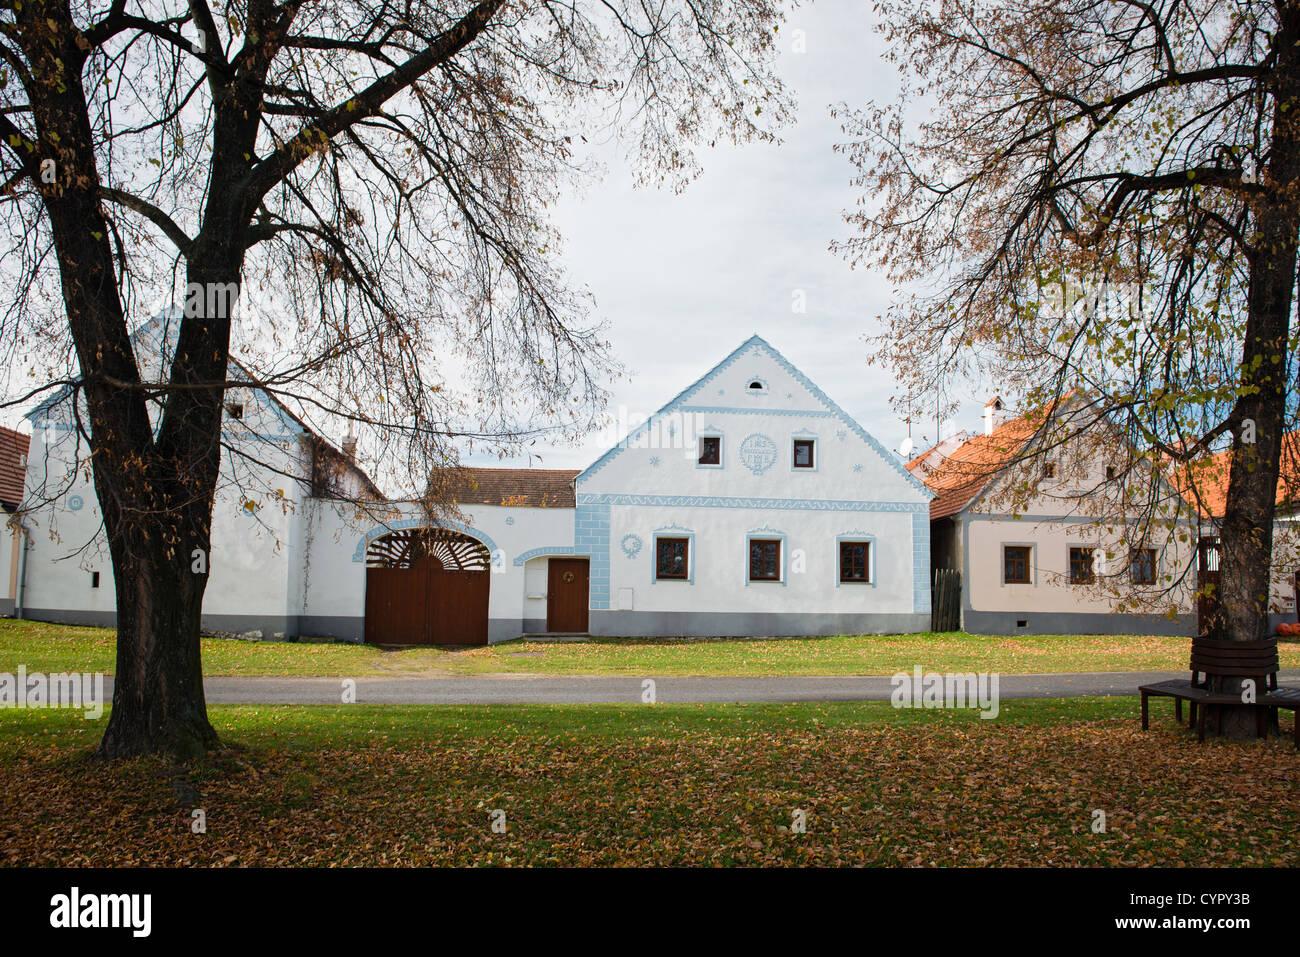 Holasovice - rural Bohemian village, UNESCO world heritage site, South Bohemia, Czech Republic - Stock Image